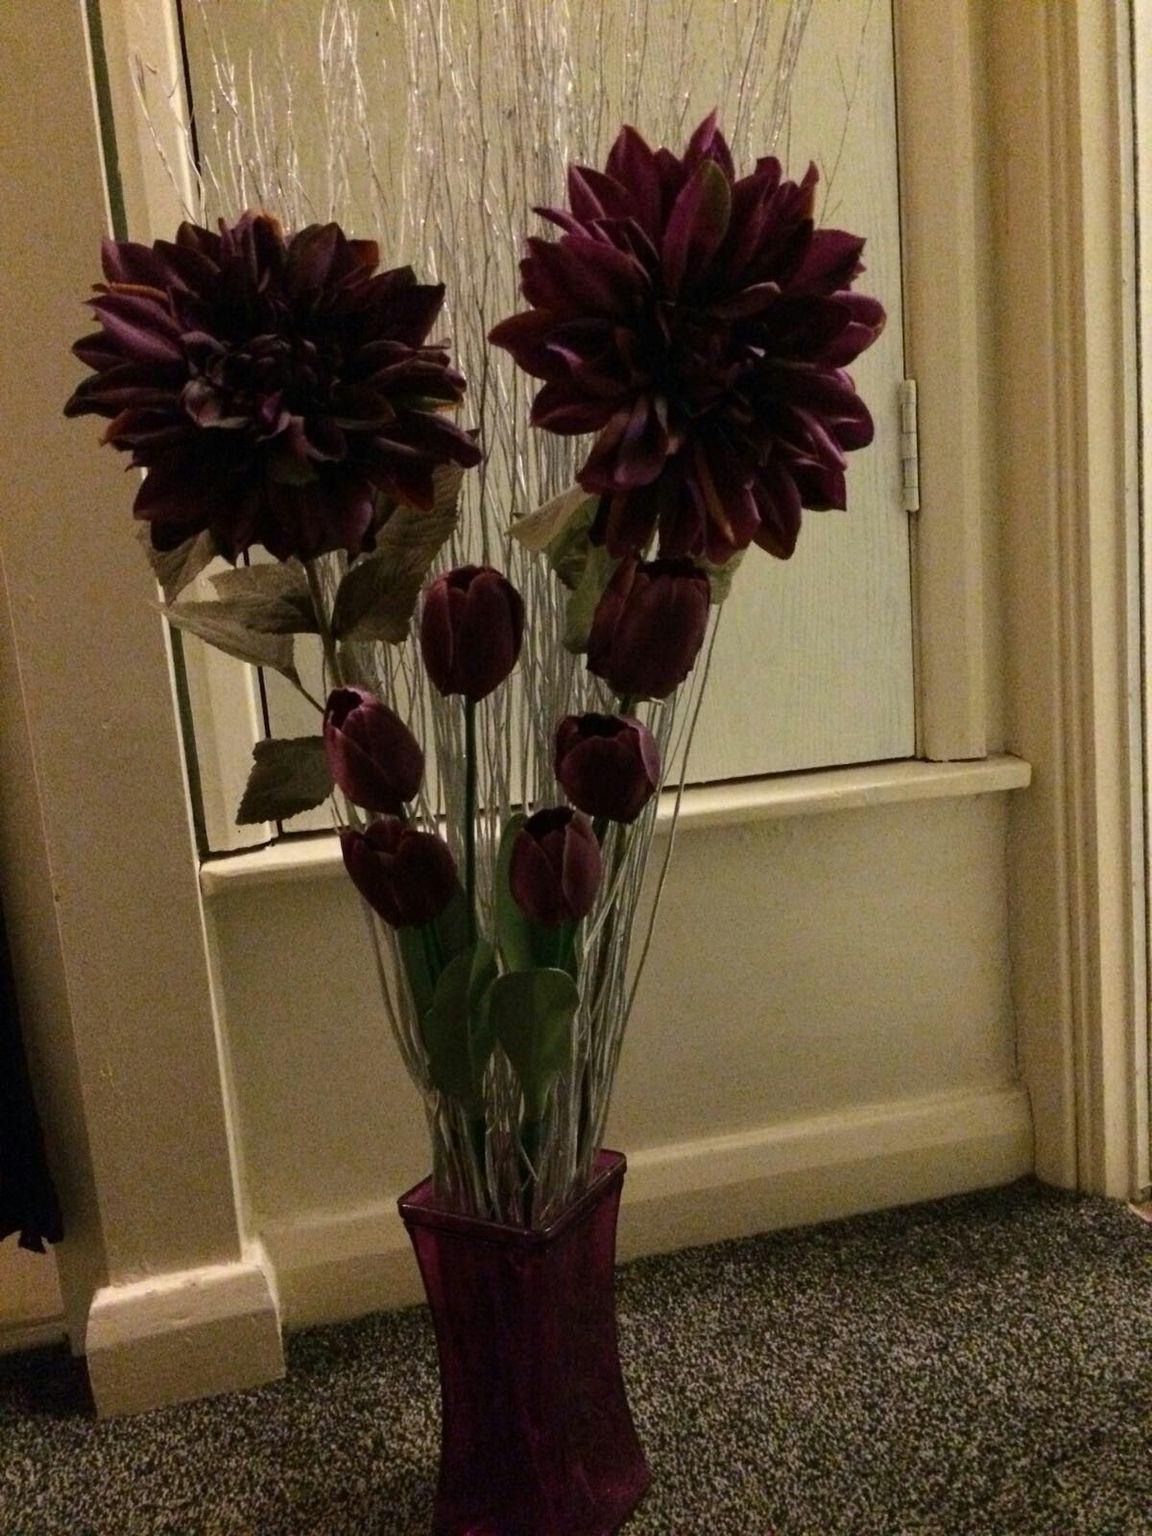 eiffel tower vases bulk free shipping of https en shpock com i wpr2nhujlmspezui 2018 08 23t040826 inside purple glass vase and flowers twiggs